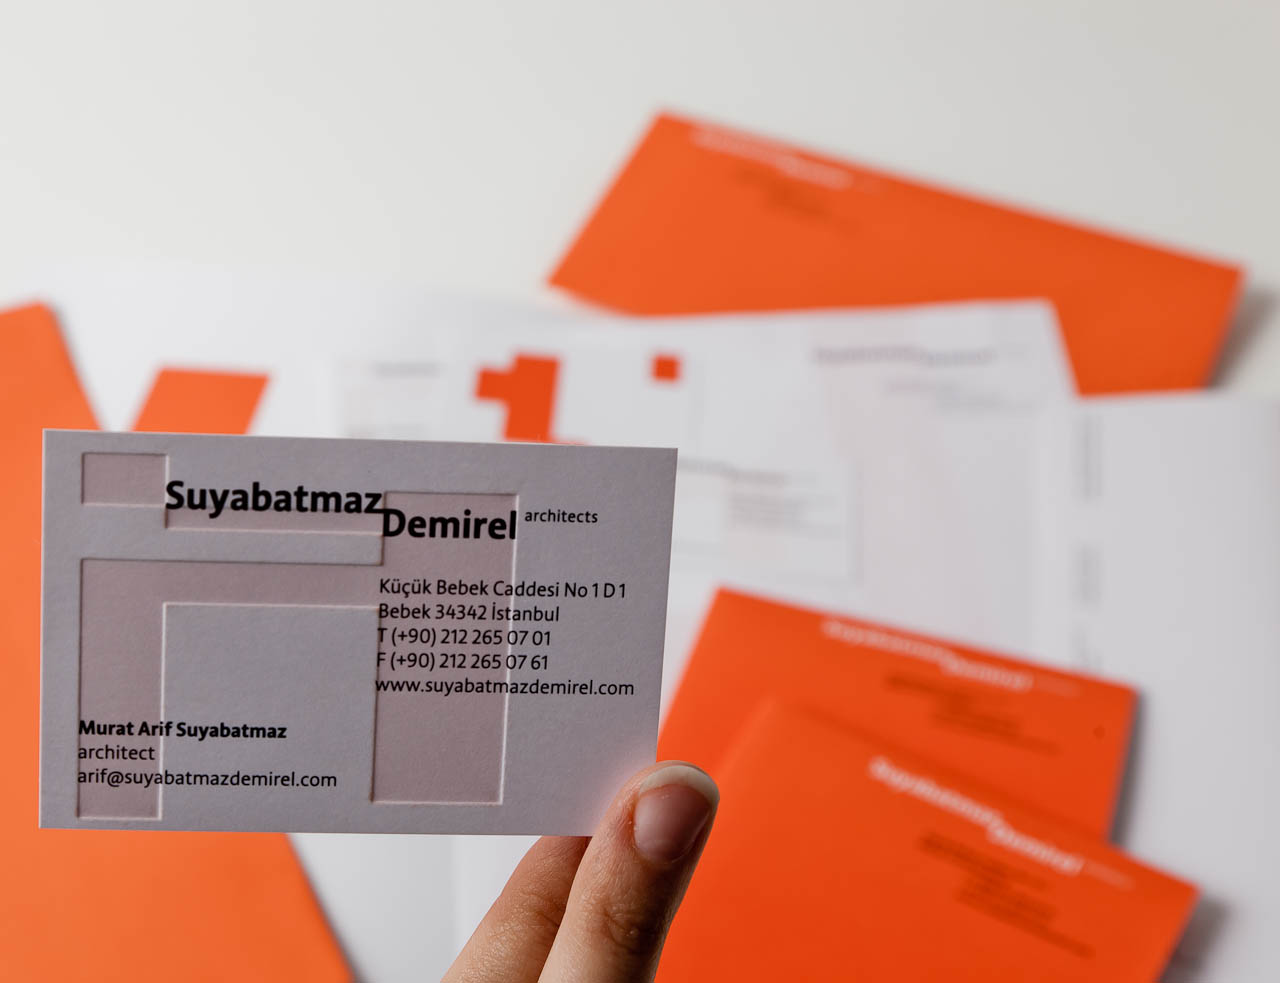 SuyabatmazDemirel (Geschaeftsdrucksorten)